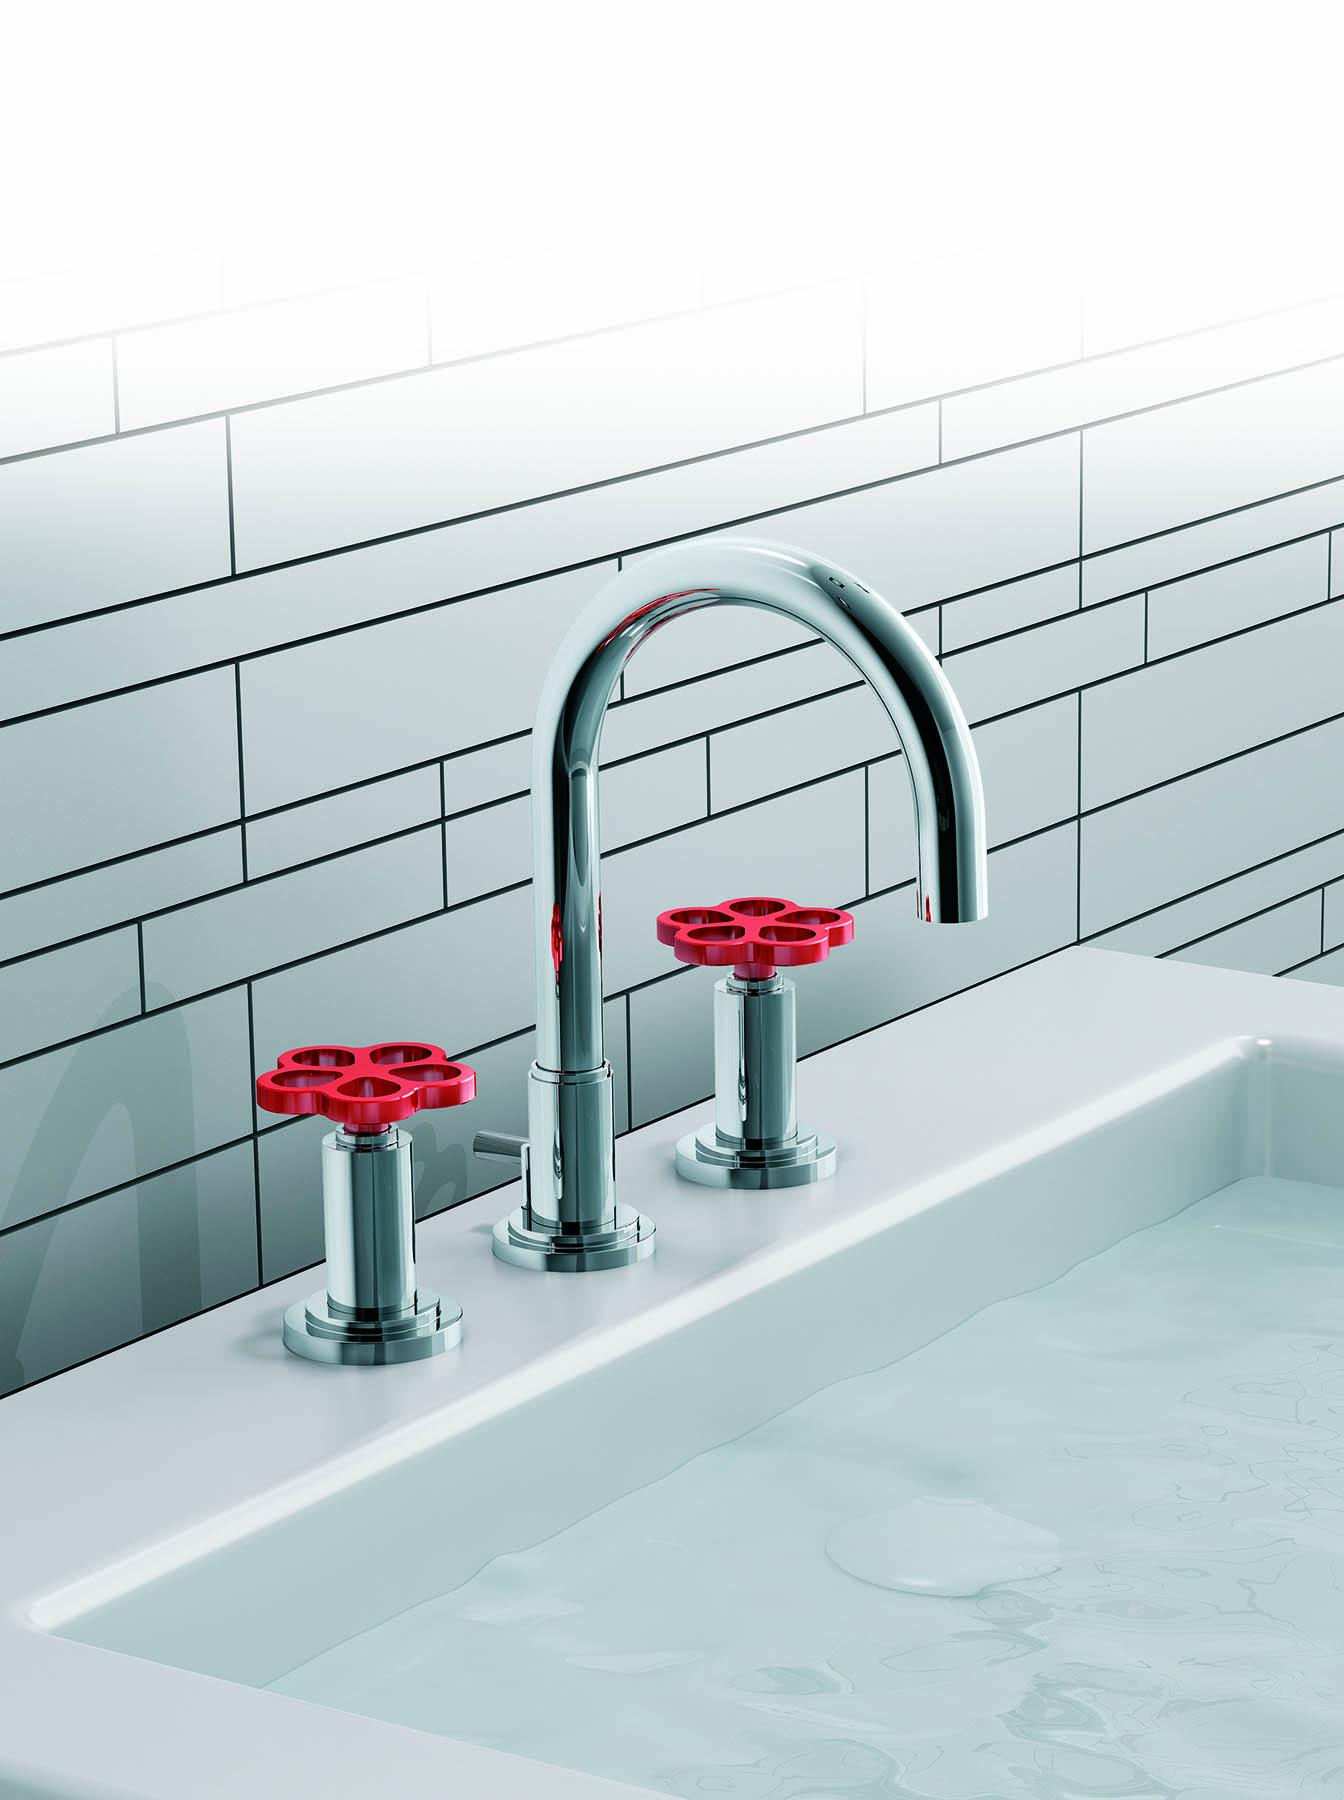 Industrial Chic Deck Mount Faucet